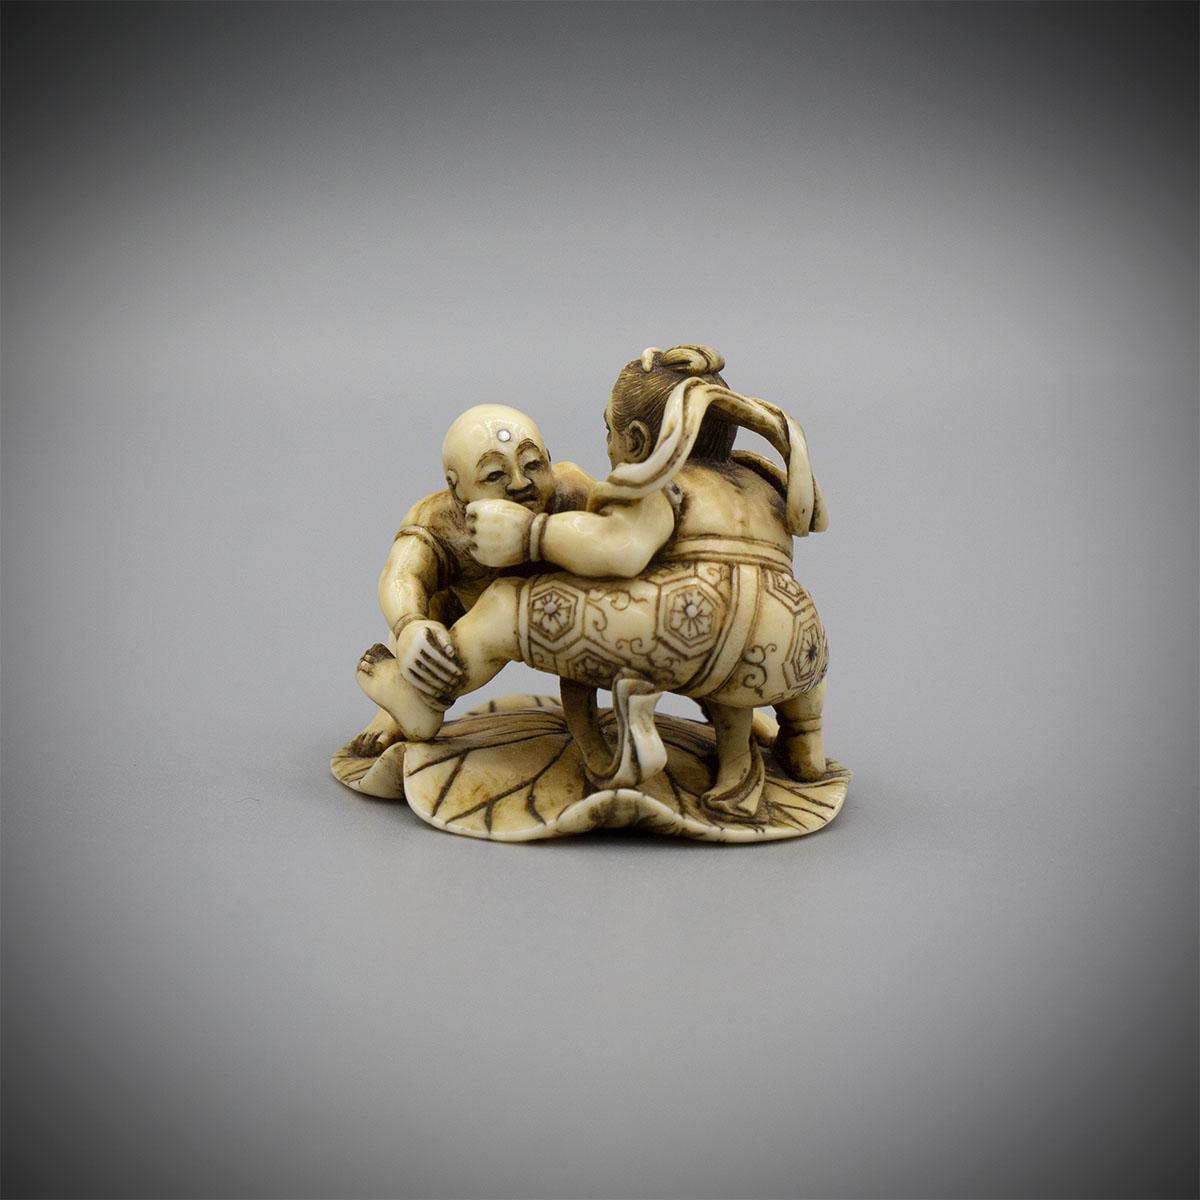 Ivory netsuke of nio and jizo bosatsu wrestling on a lotus leaf, Shugyoku, MR3191_V2